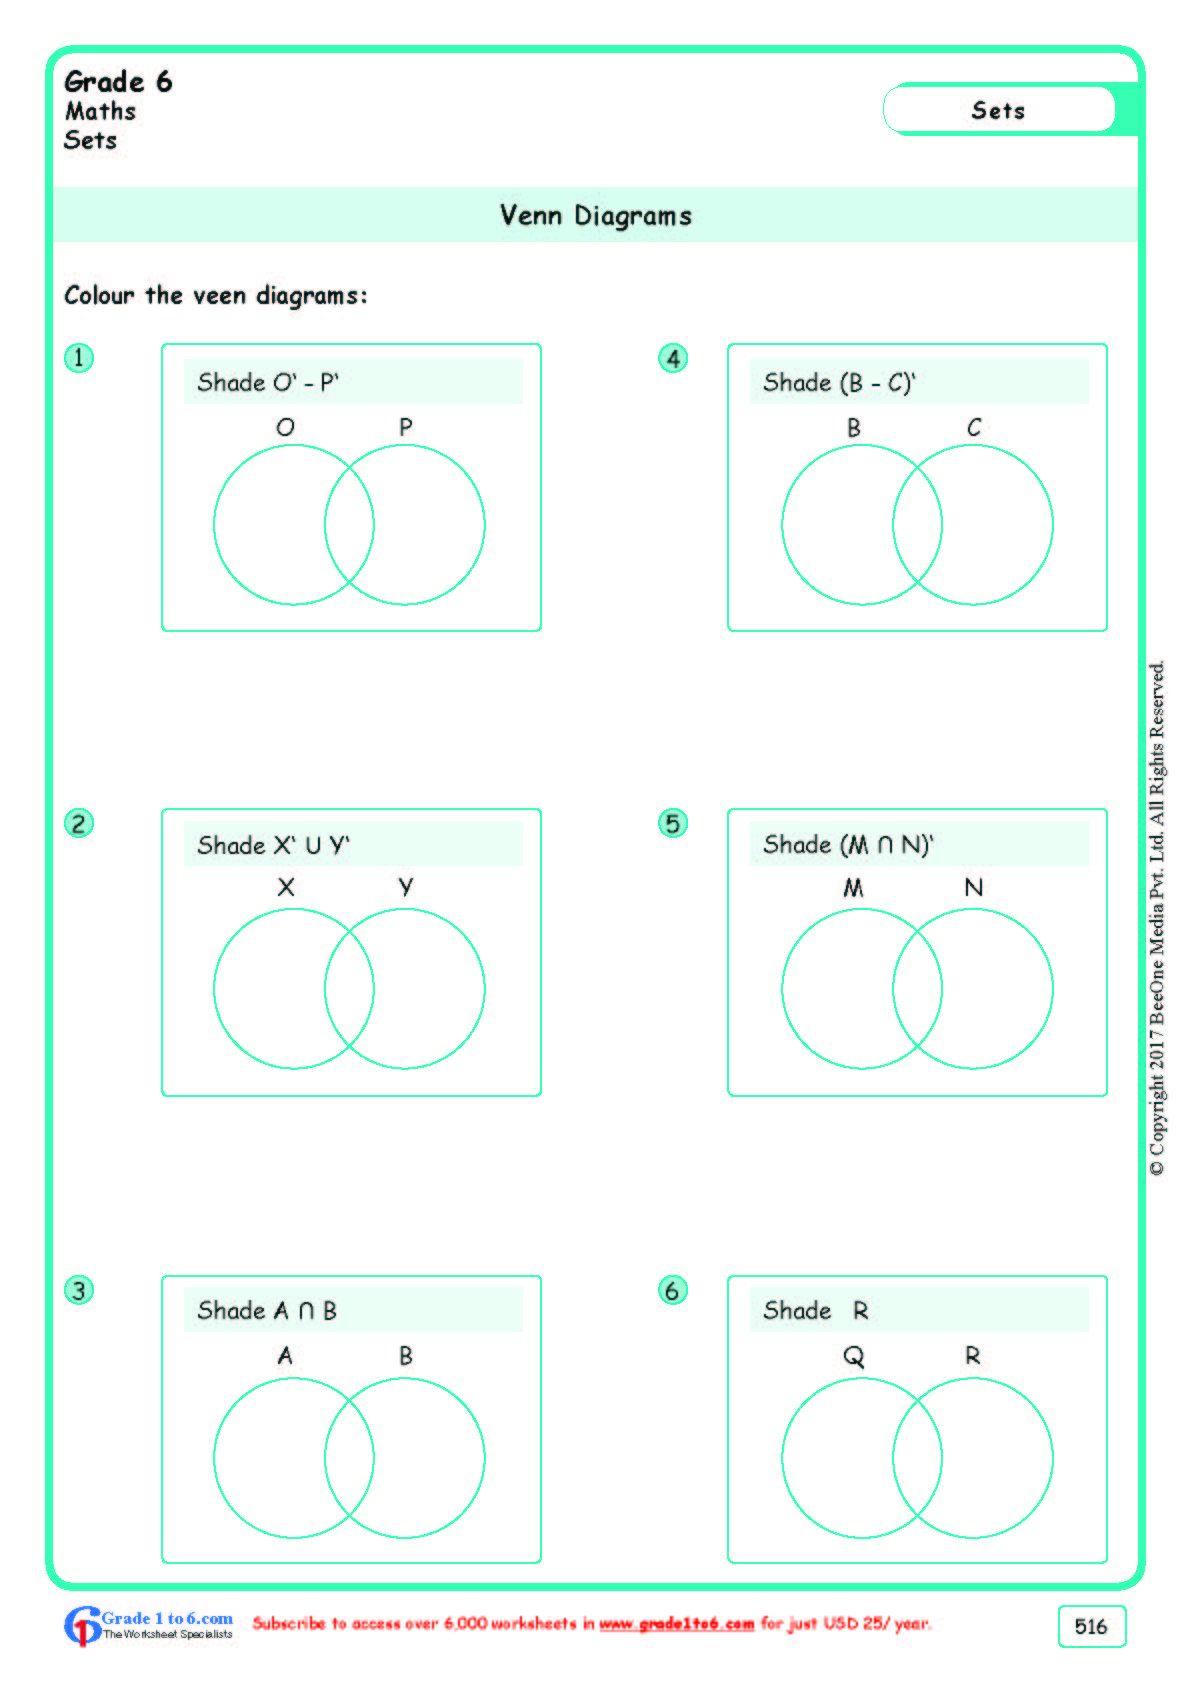 Worksheet Grade 6 Math Enn Diagrams In